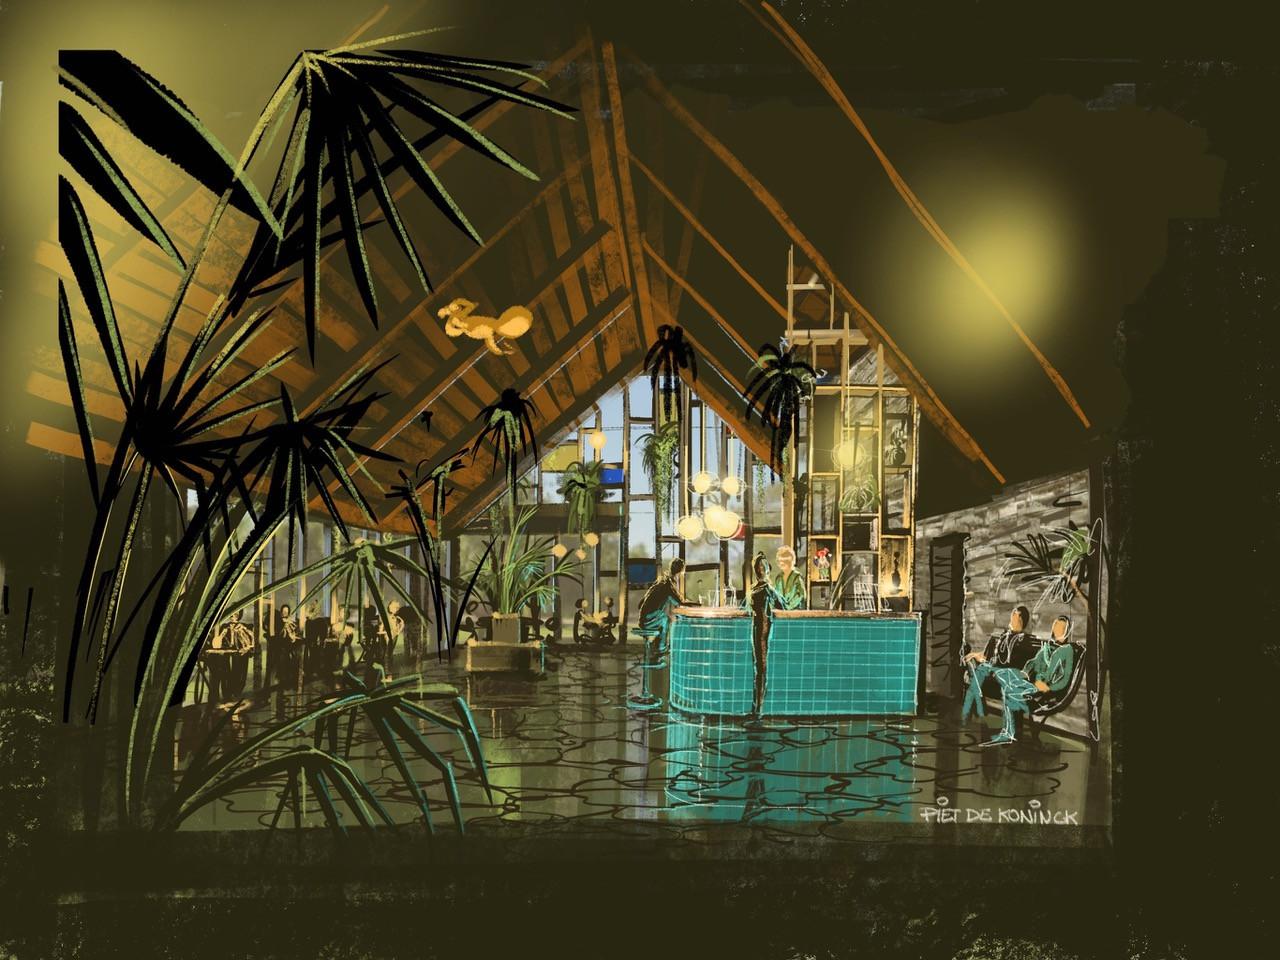 houten_gebouw_rustieke_constructie_cb5b3b26b8e4e66381455f451f3e02d2.jpeg